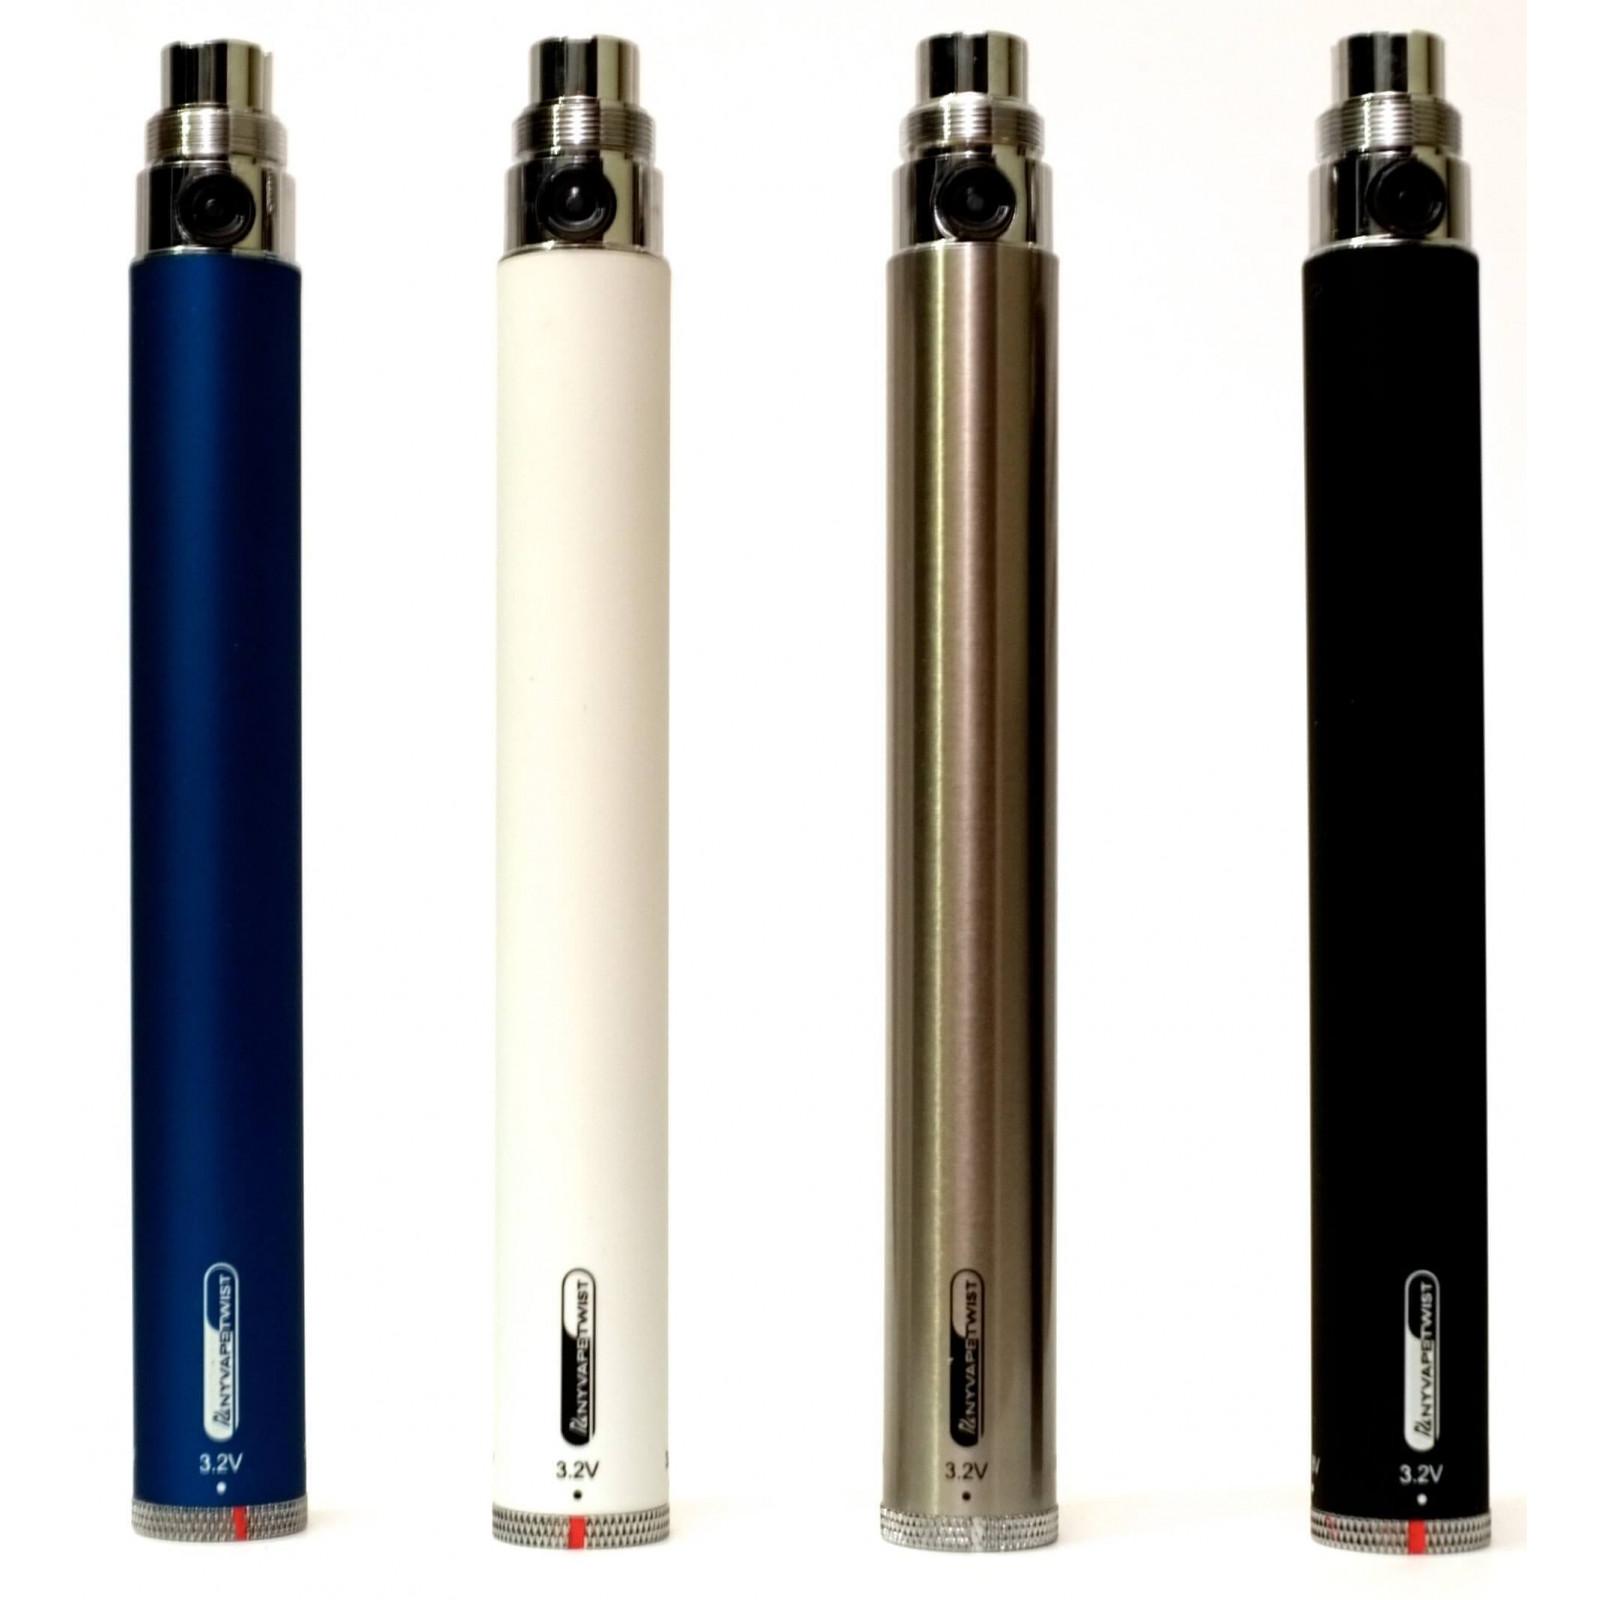 EGO-C TWIST 1100 MAH - LE PETIT FUMEUR